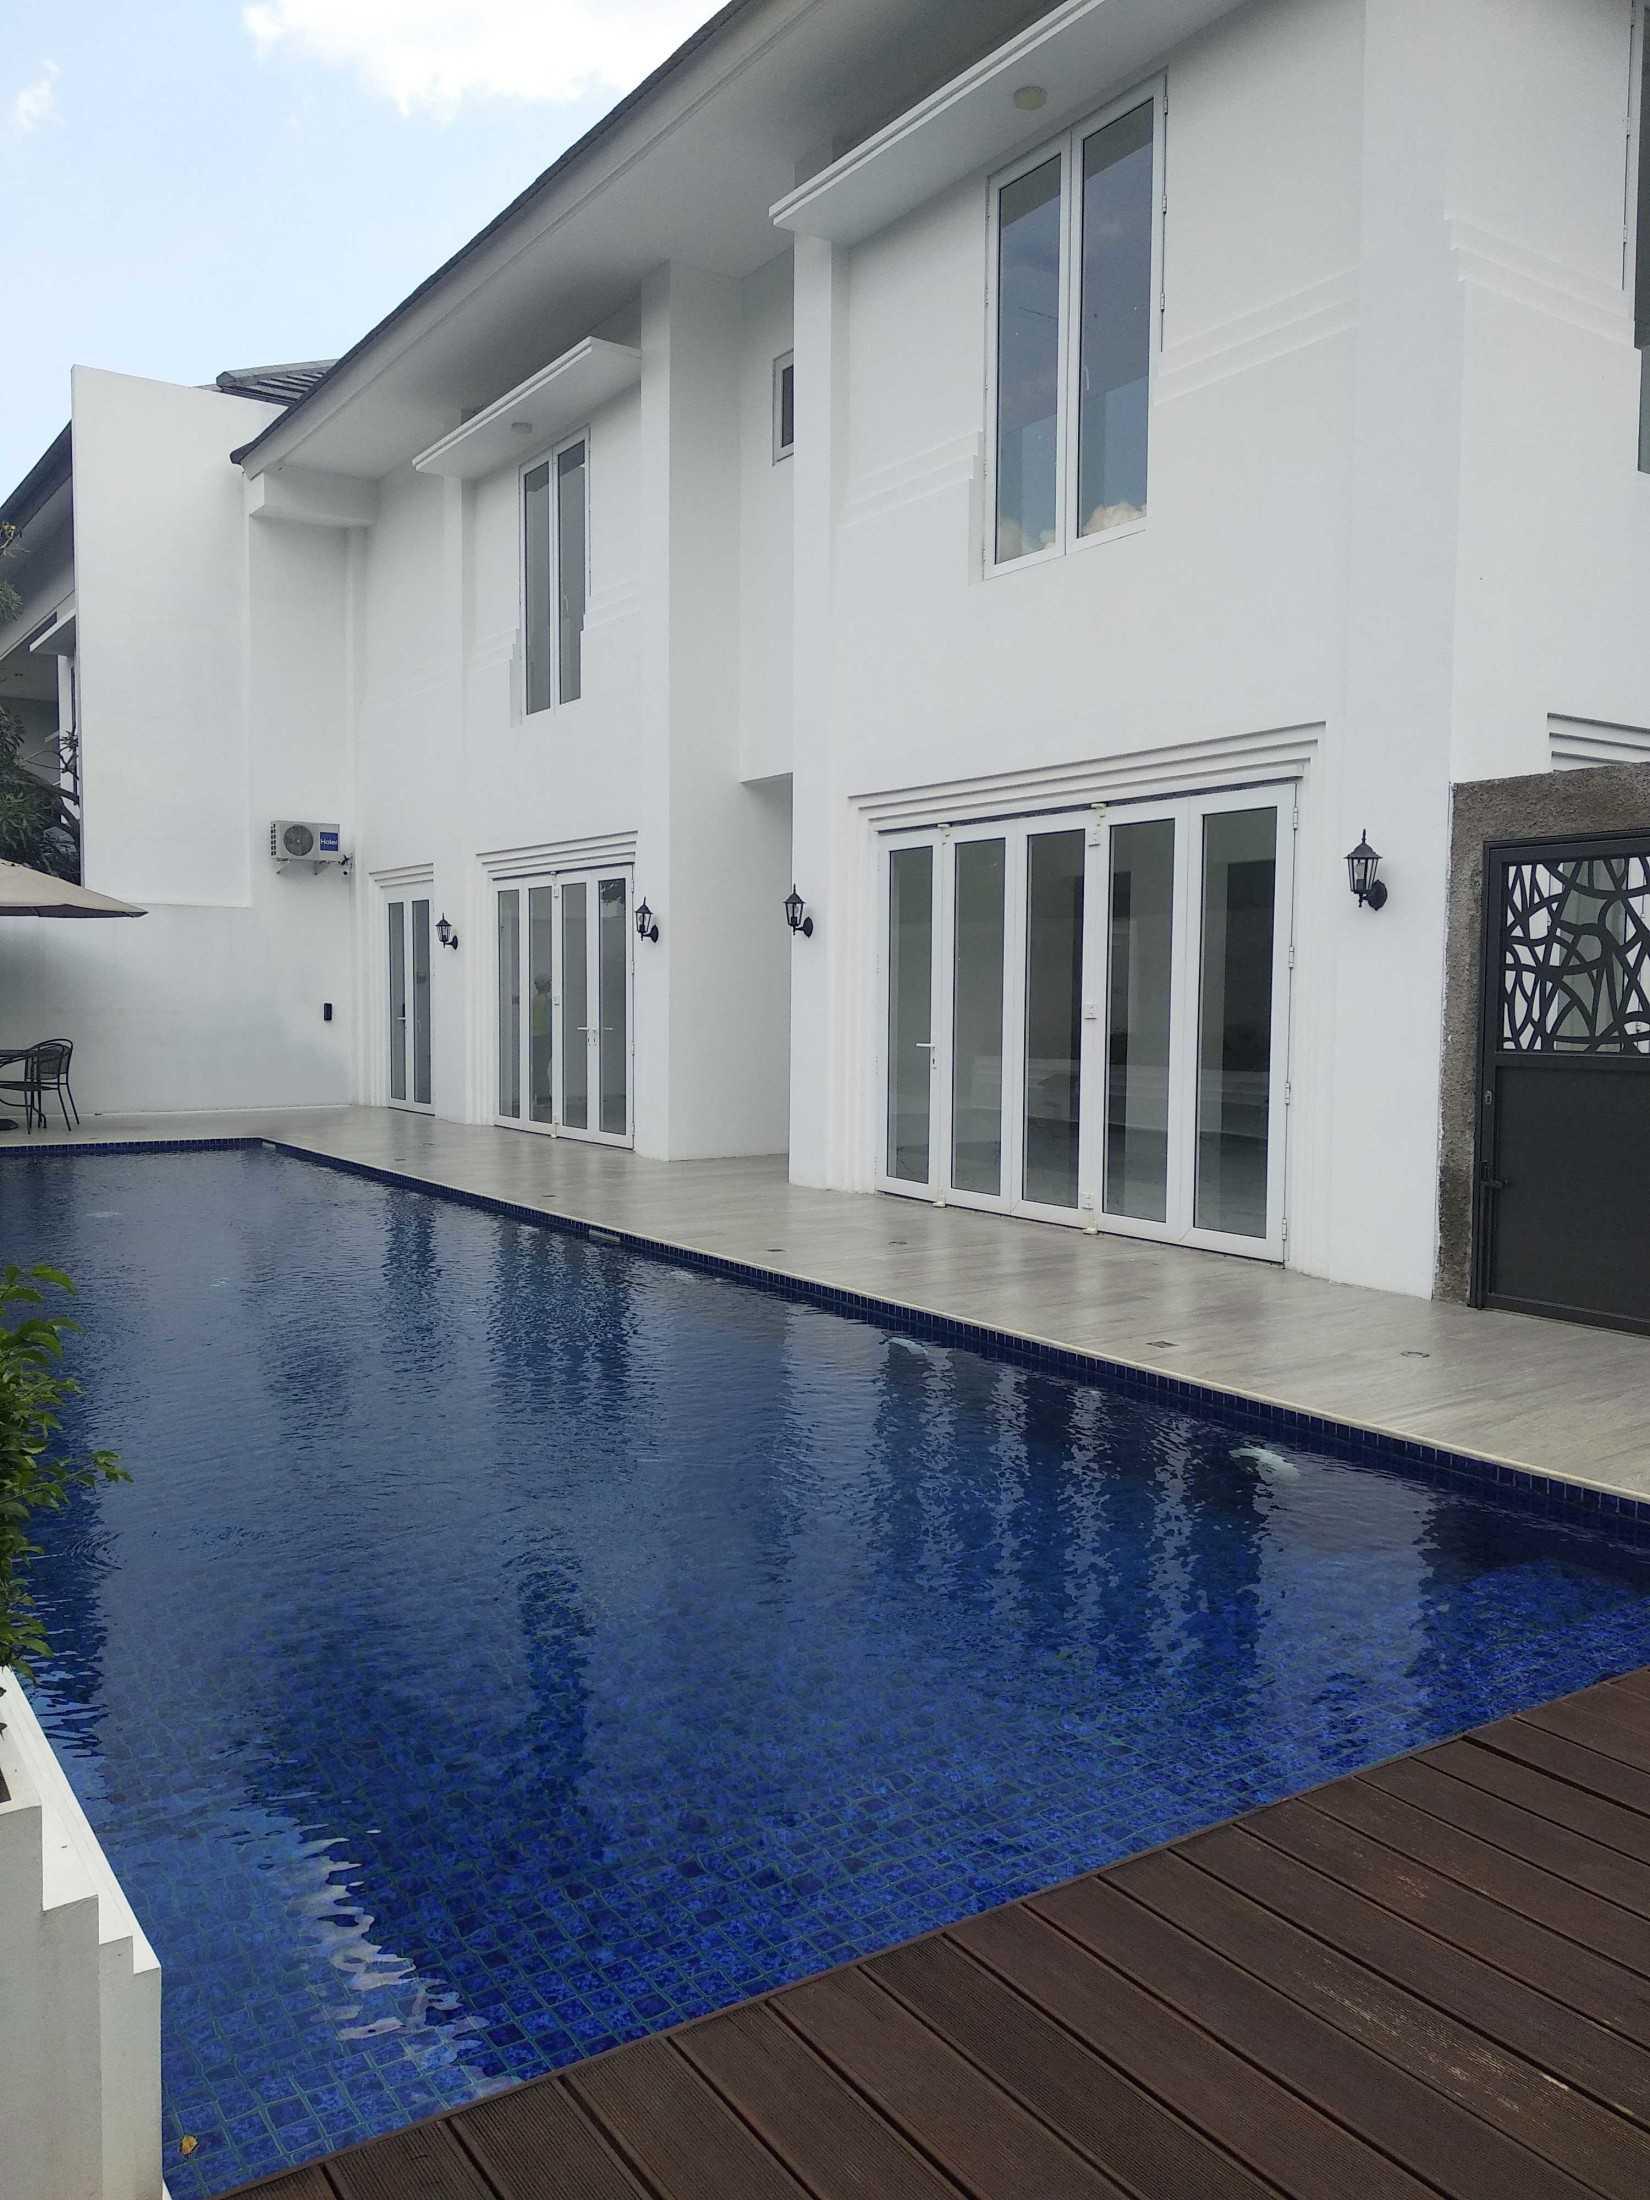 Arkitekt.id Setraduta Kencana Bandung Bandung Sk House - Swimming Pool  69590